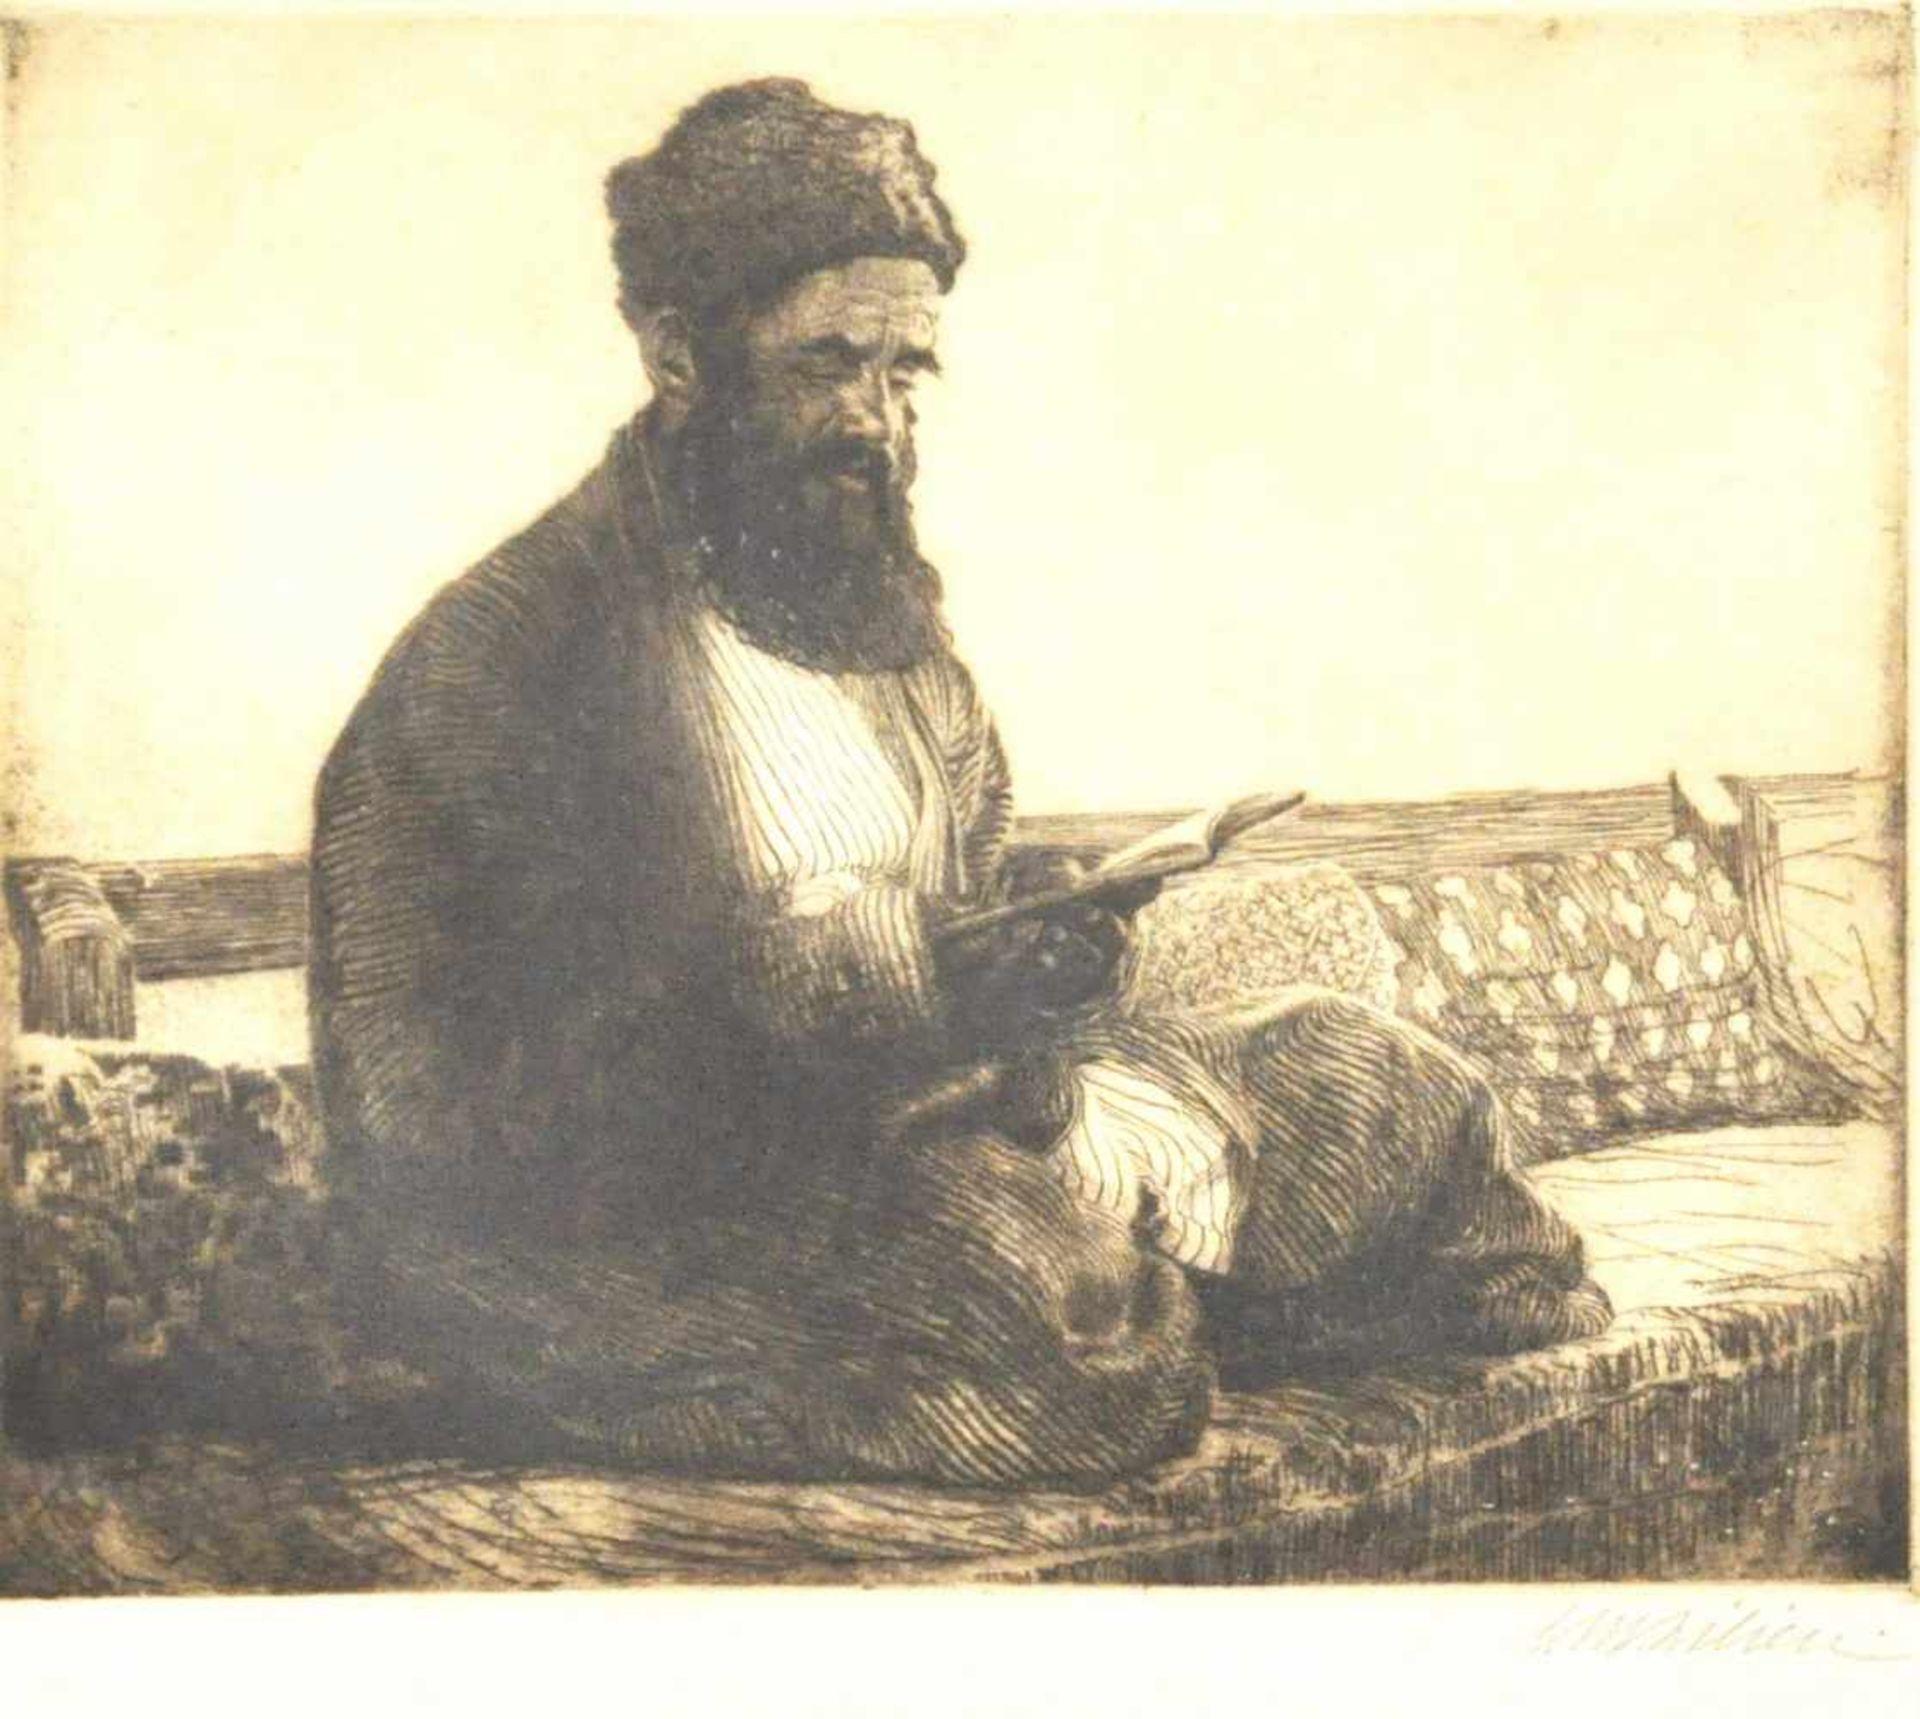 "Lilien, Moshe E. (1874 - 1925)""Jüdischer Bucharer beim Lesen"", Radierung, 26,5 x 32 cm, rechts unten"